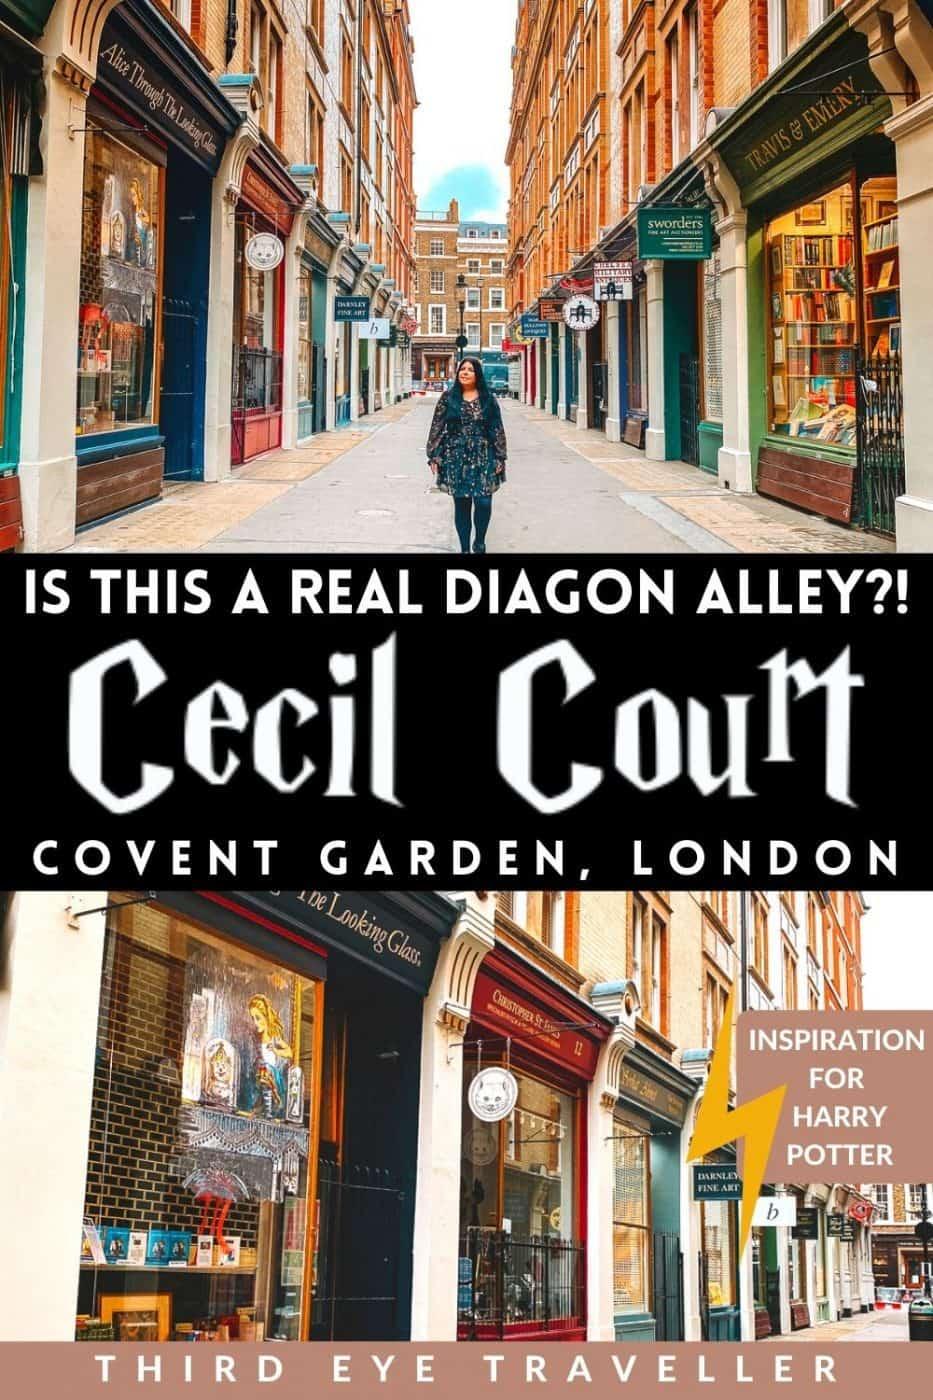 HarrY potter Cecil Court London Diagon Alley inspiration